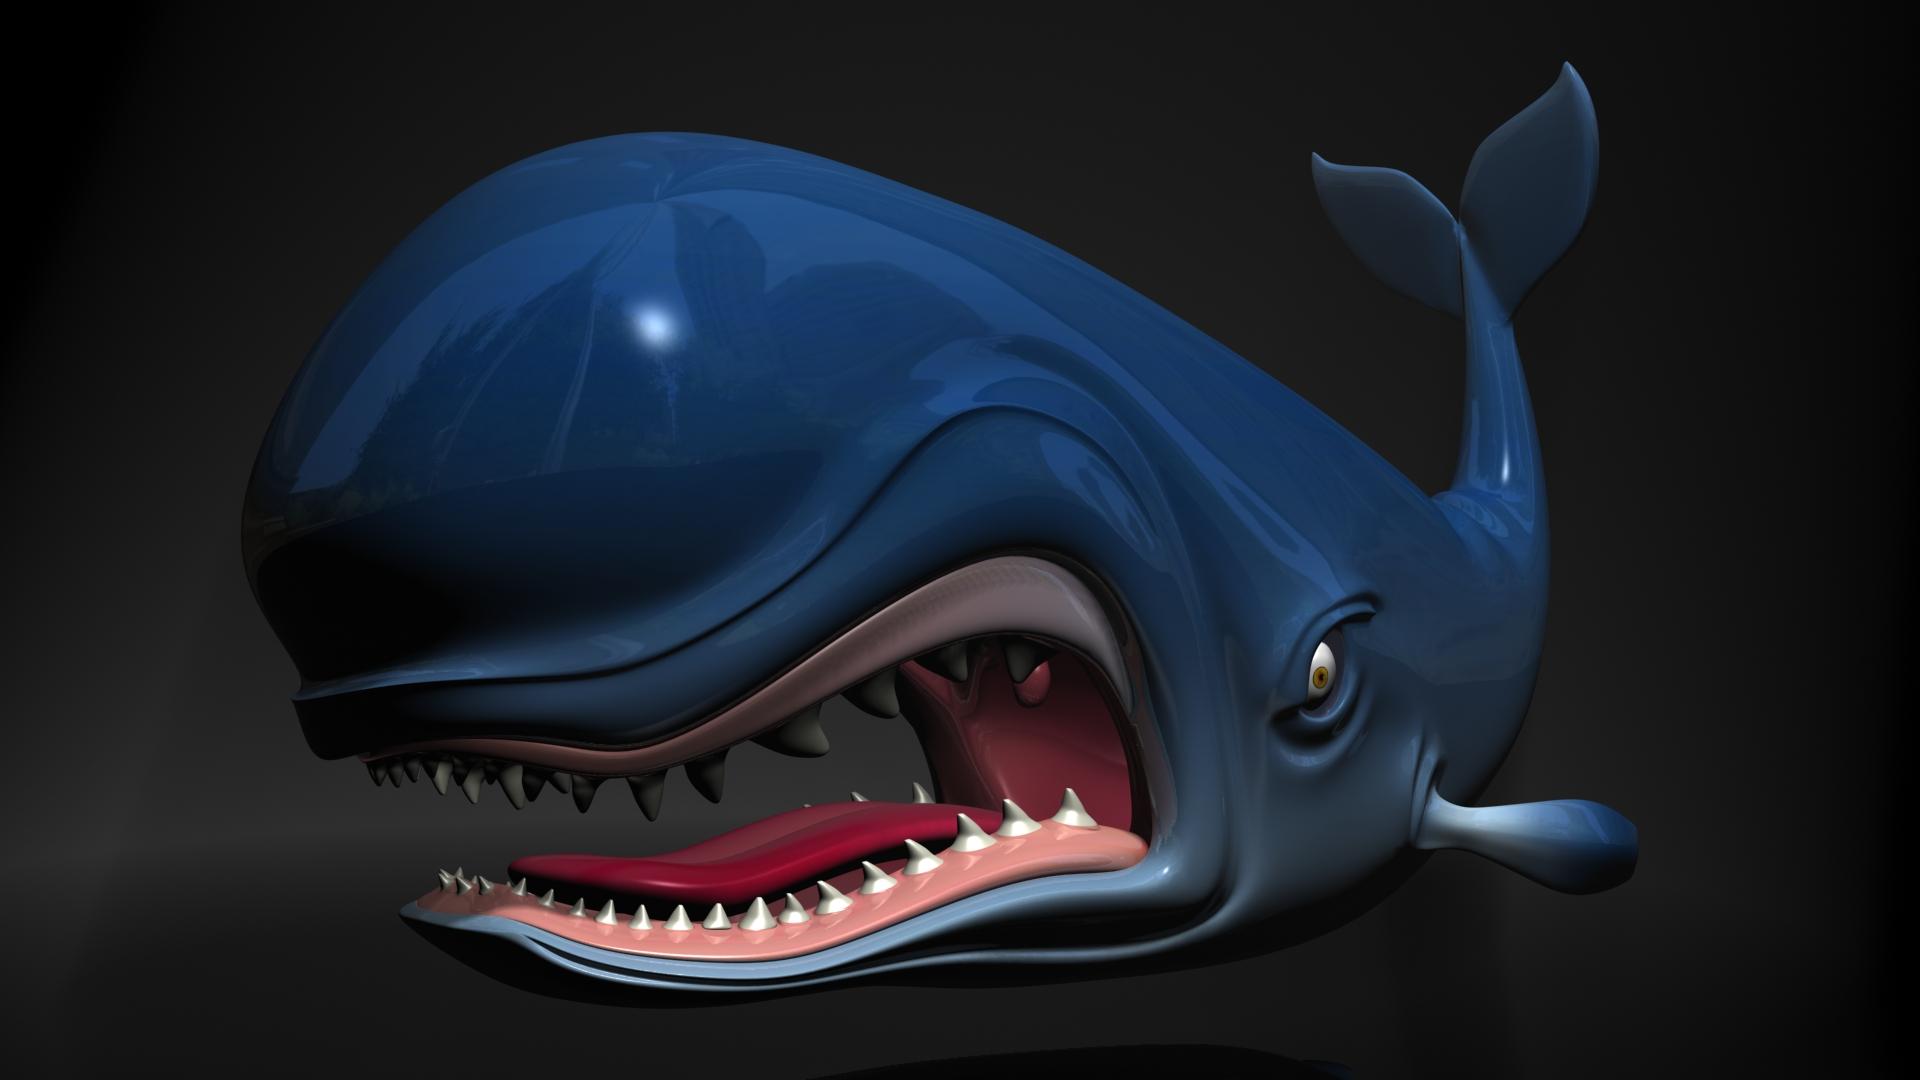 3d Whale Hd 3d 4k Wallpapers Images Backgrounds Photos